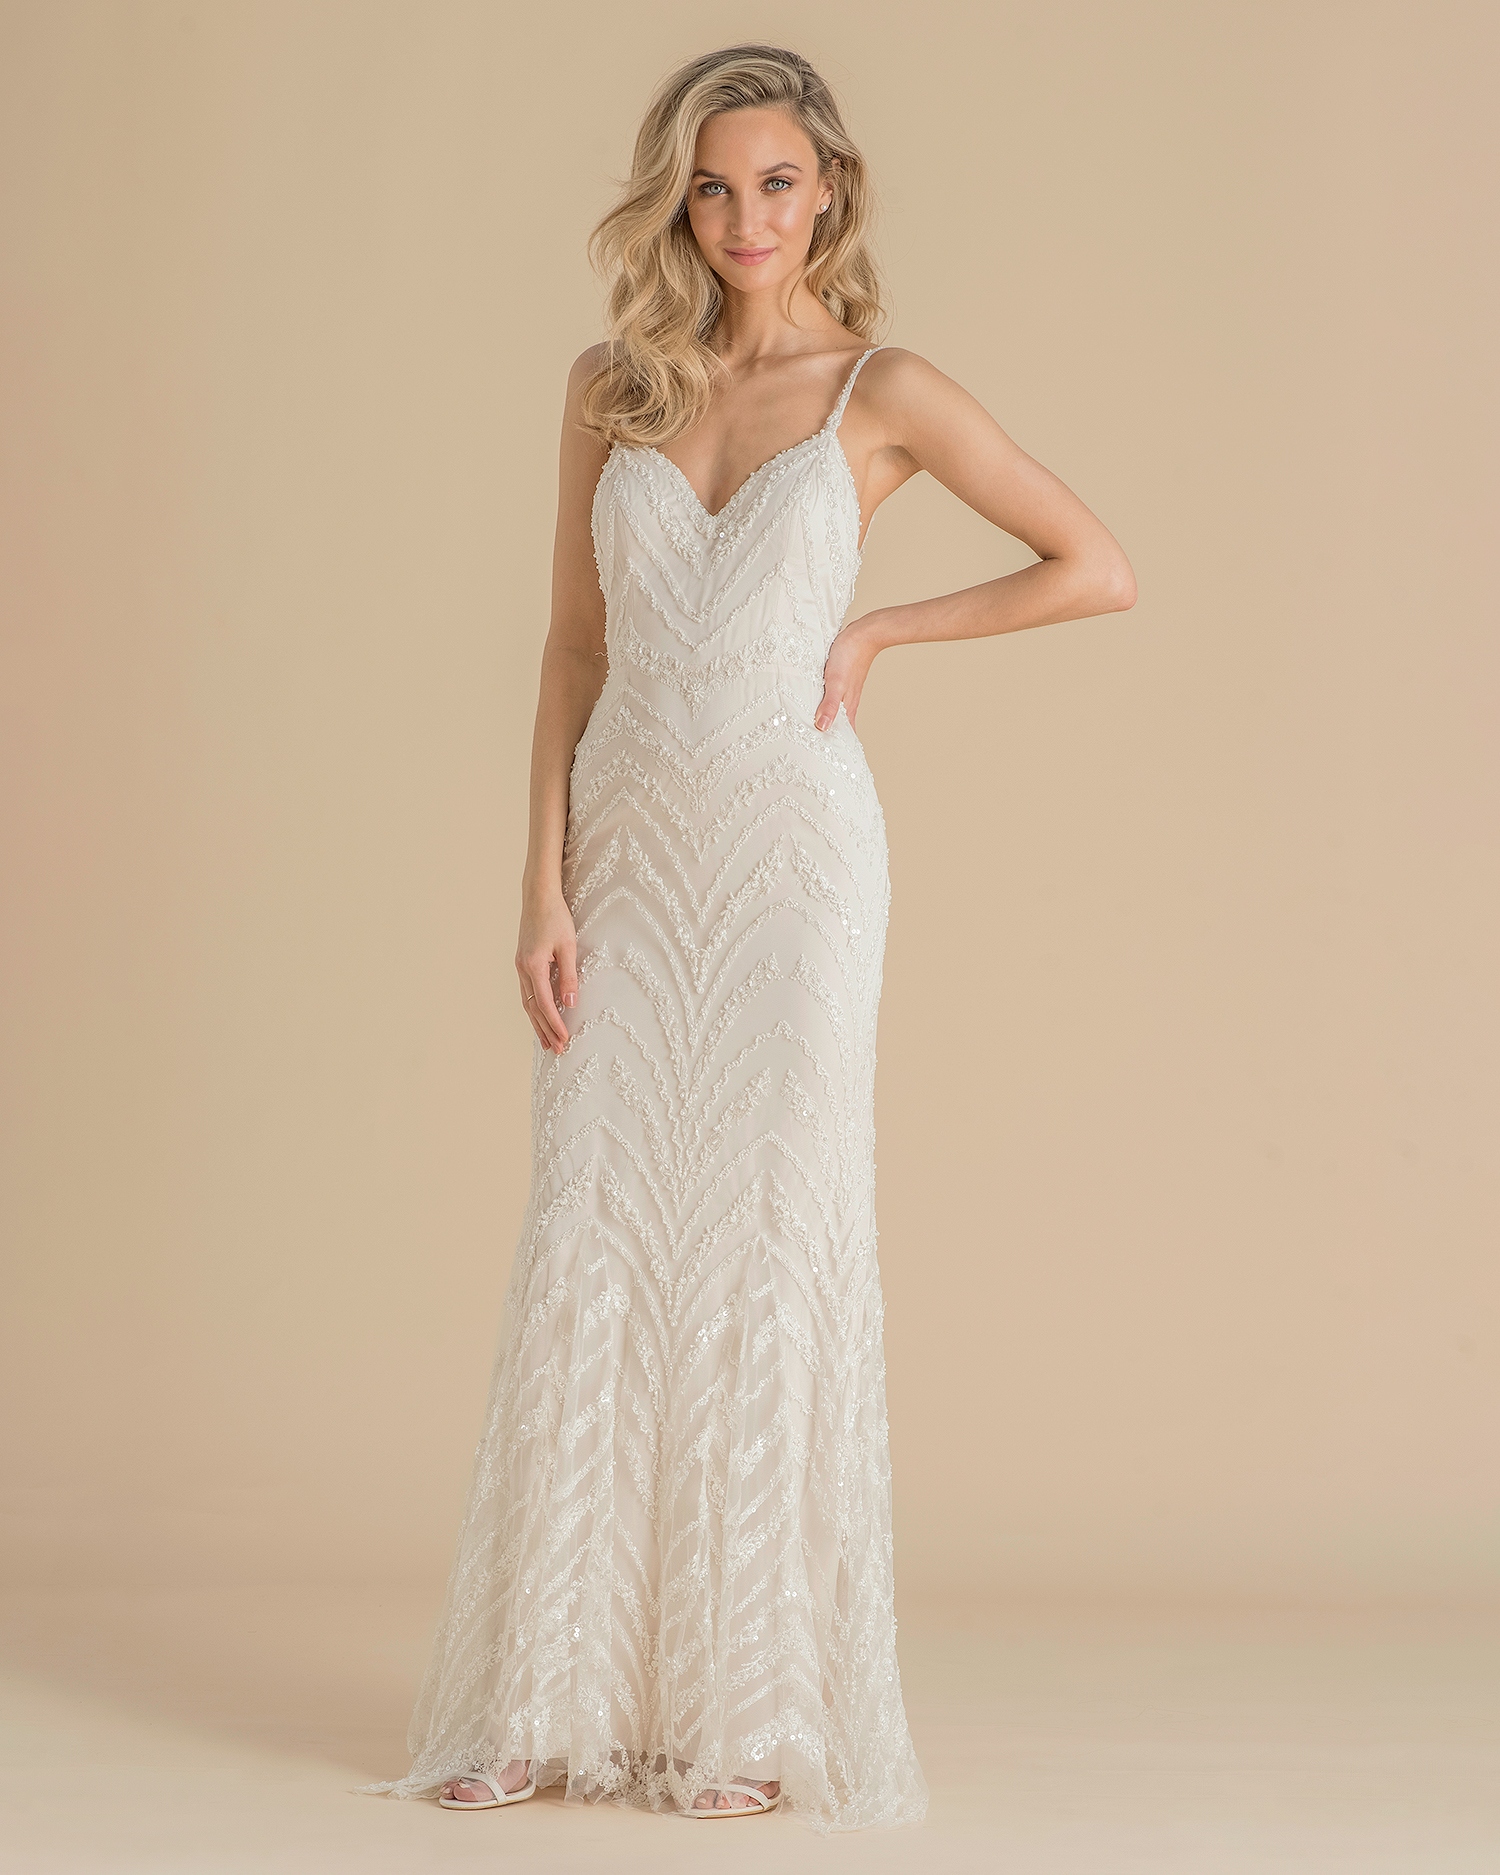 catherine deane wedding dress spring 2019 spaghetti-strap with beadwork